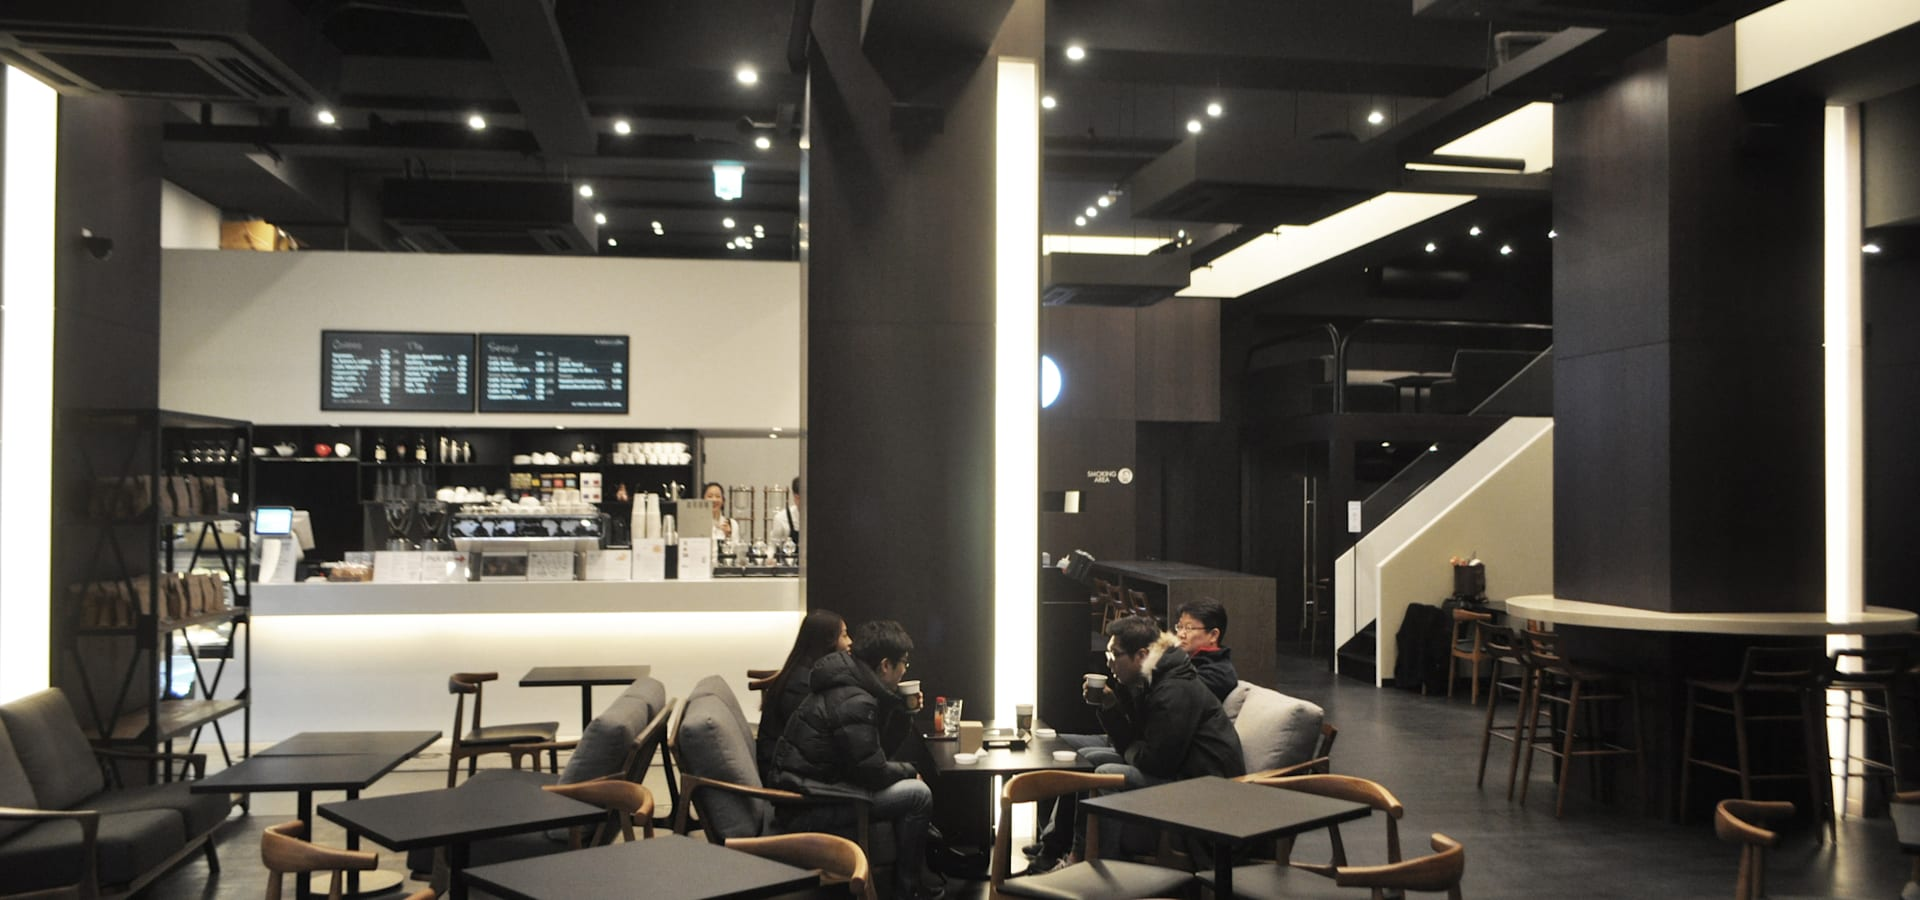 The november design group _ 더 노벰버